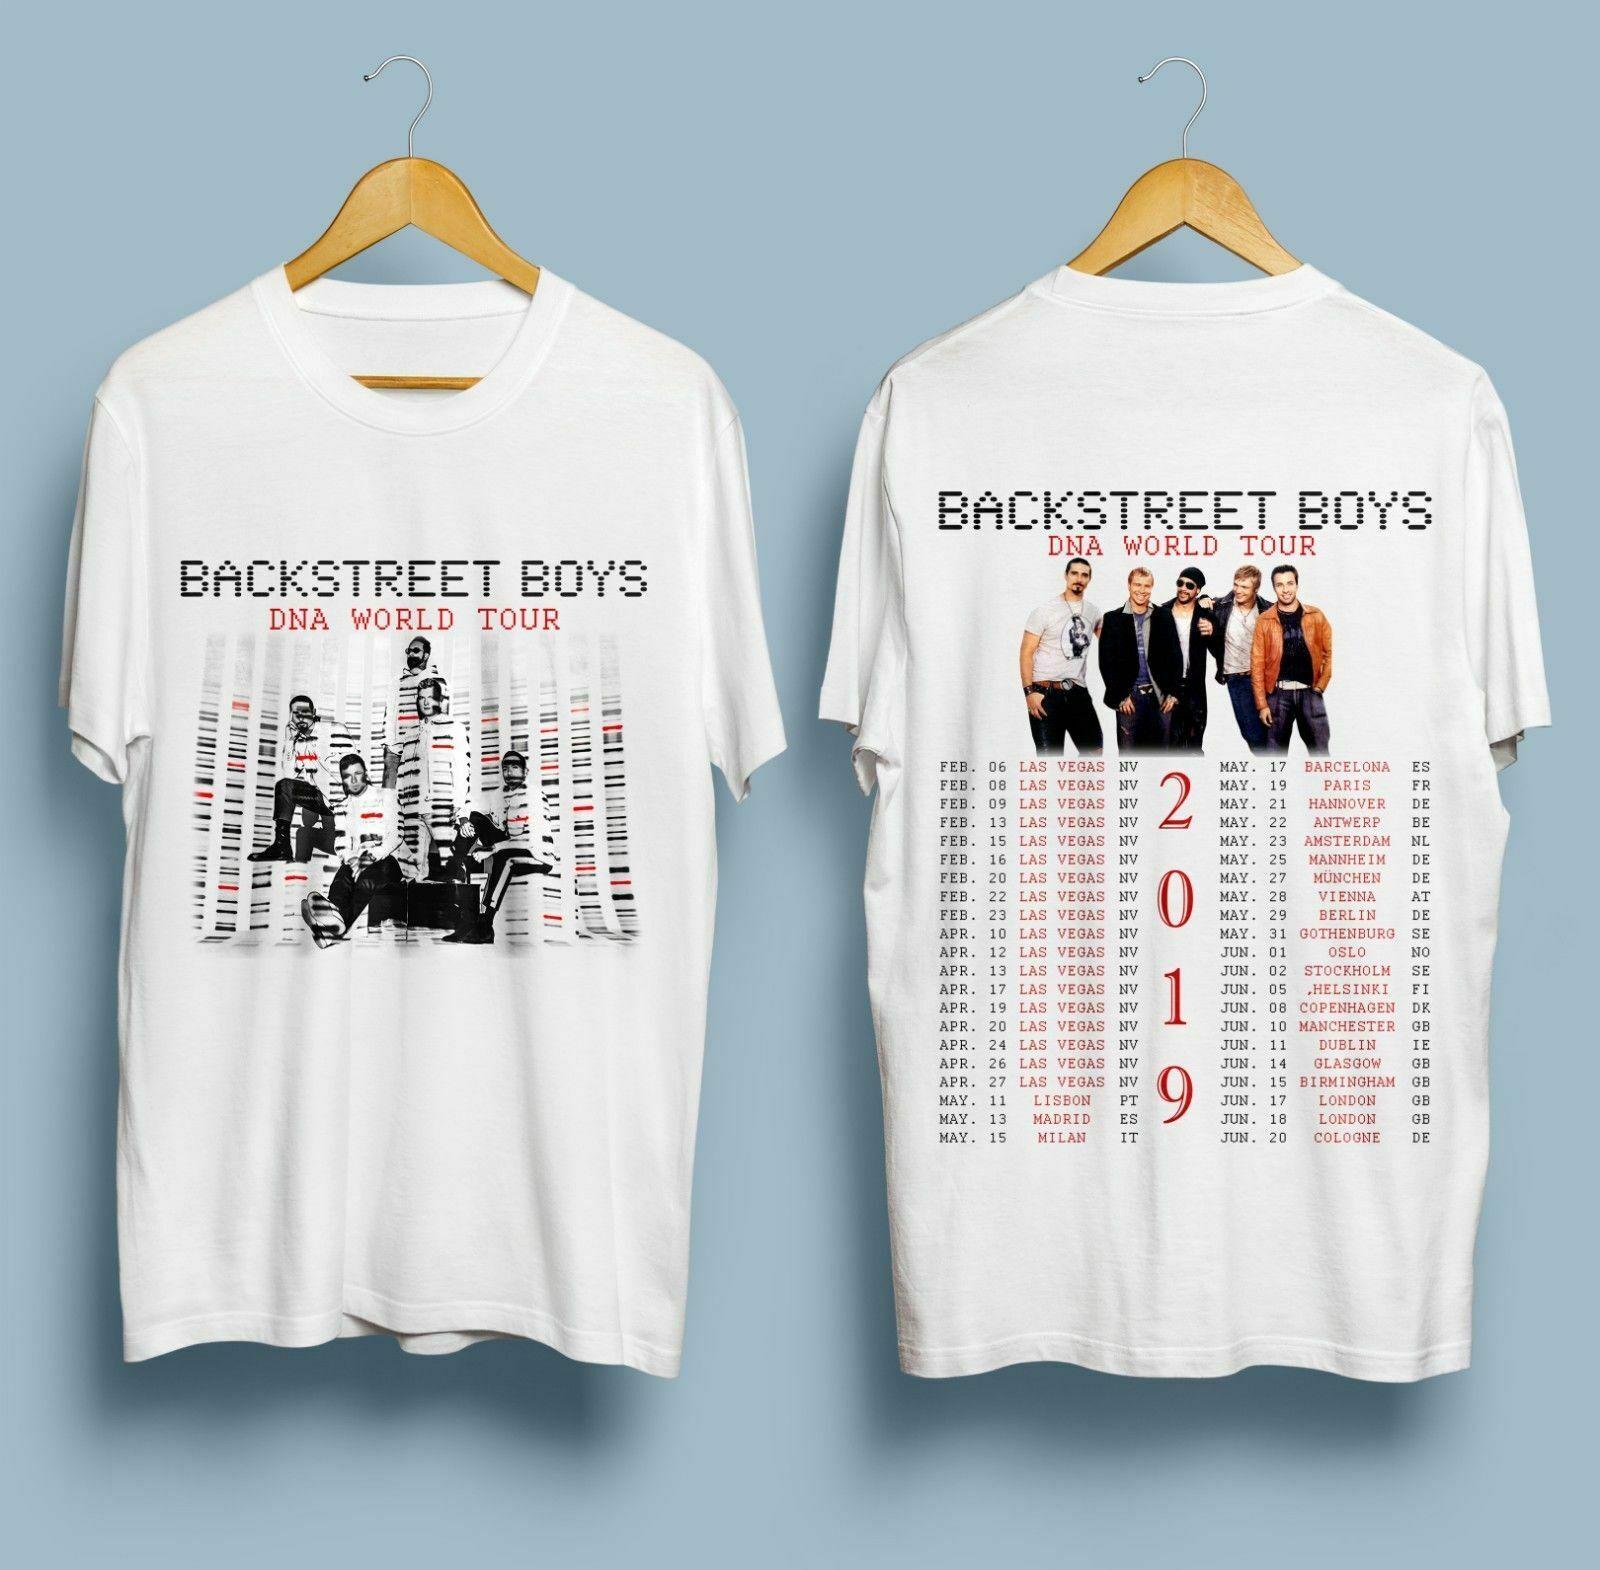 RARE ITEMS Backstreet Boys Las Vegas & DNA World Tour 2020 T-SHIRT S-3XL Fashion T Shirt Hipster Cool Tops Tee Plus Size